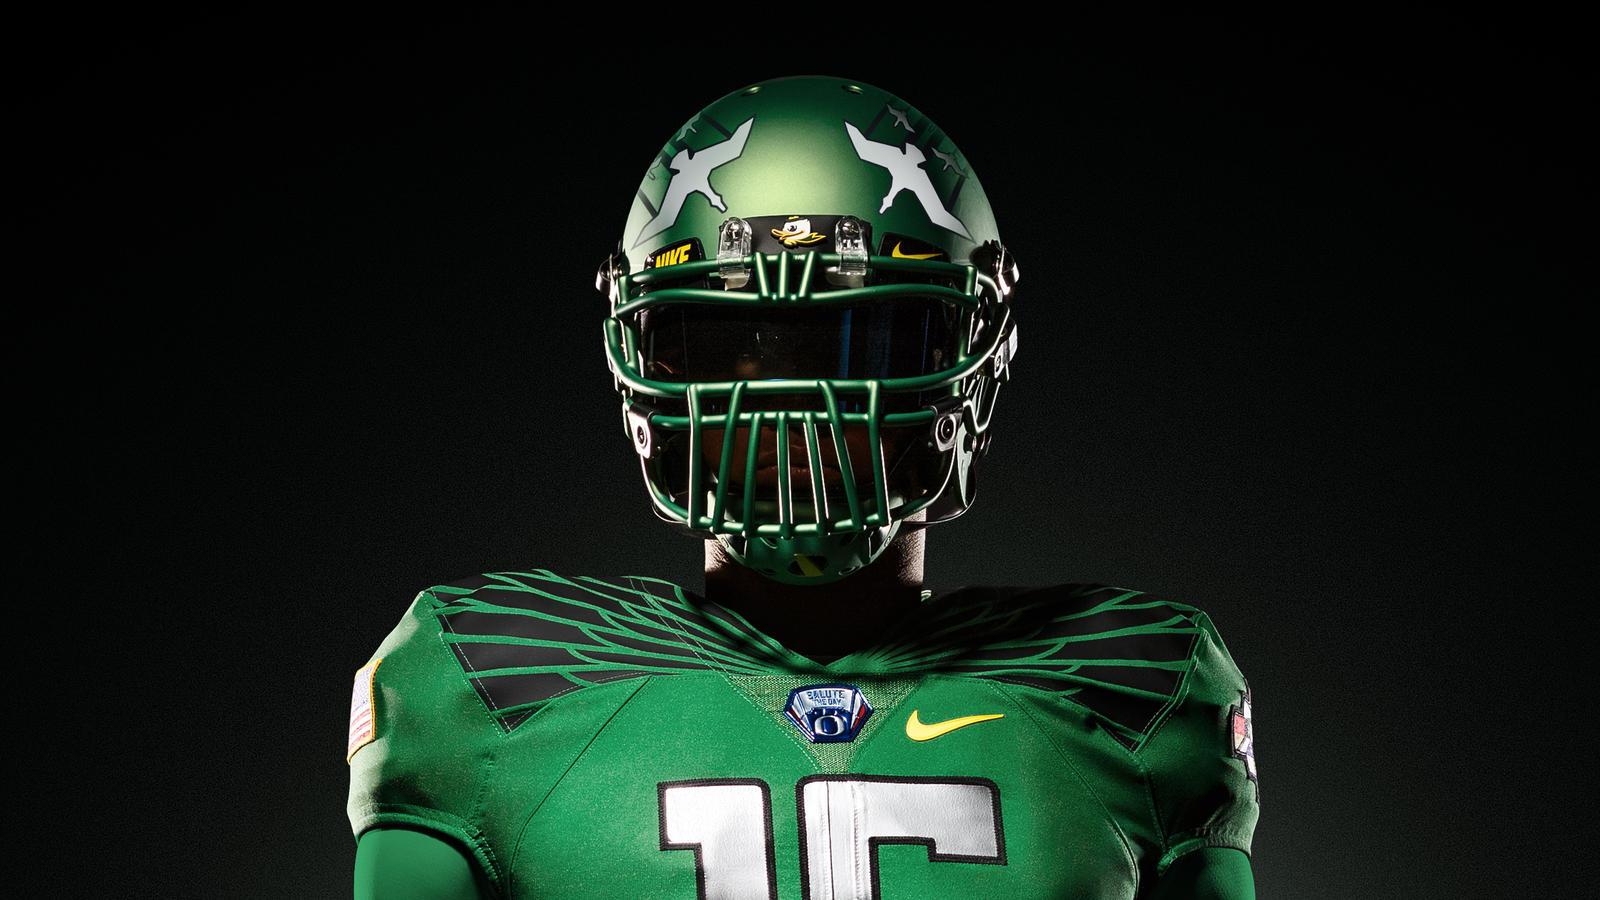 150320_Nike_Oregon_Helm_Home_hd_1600 (1)